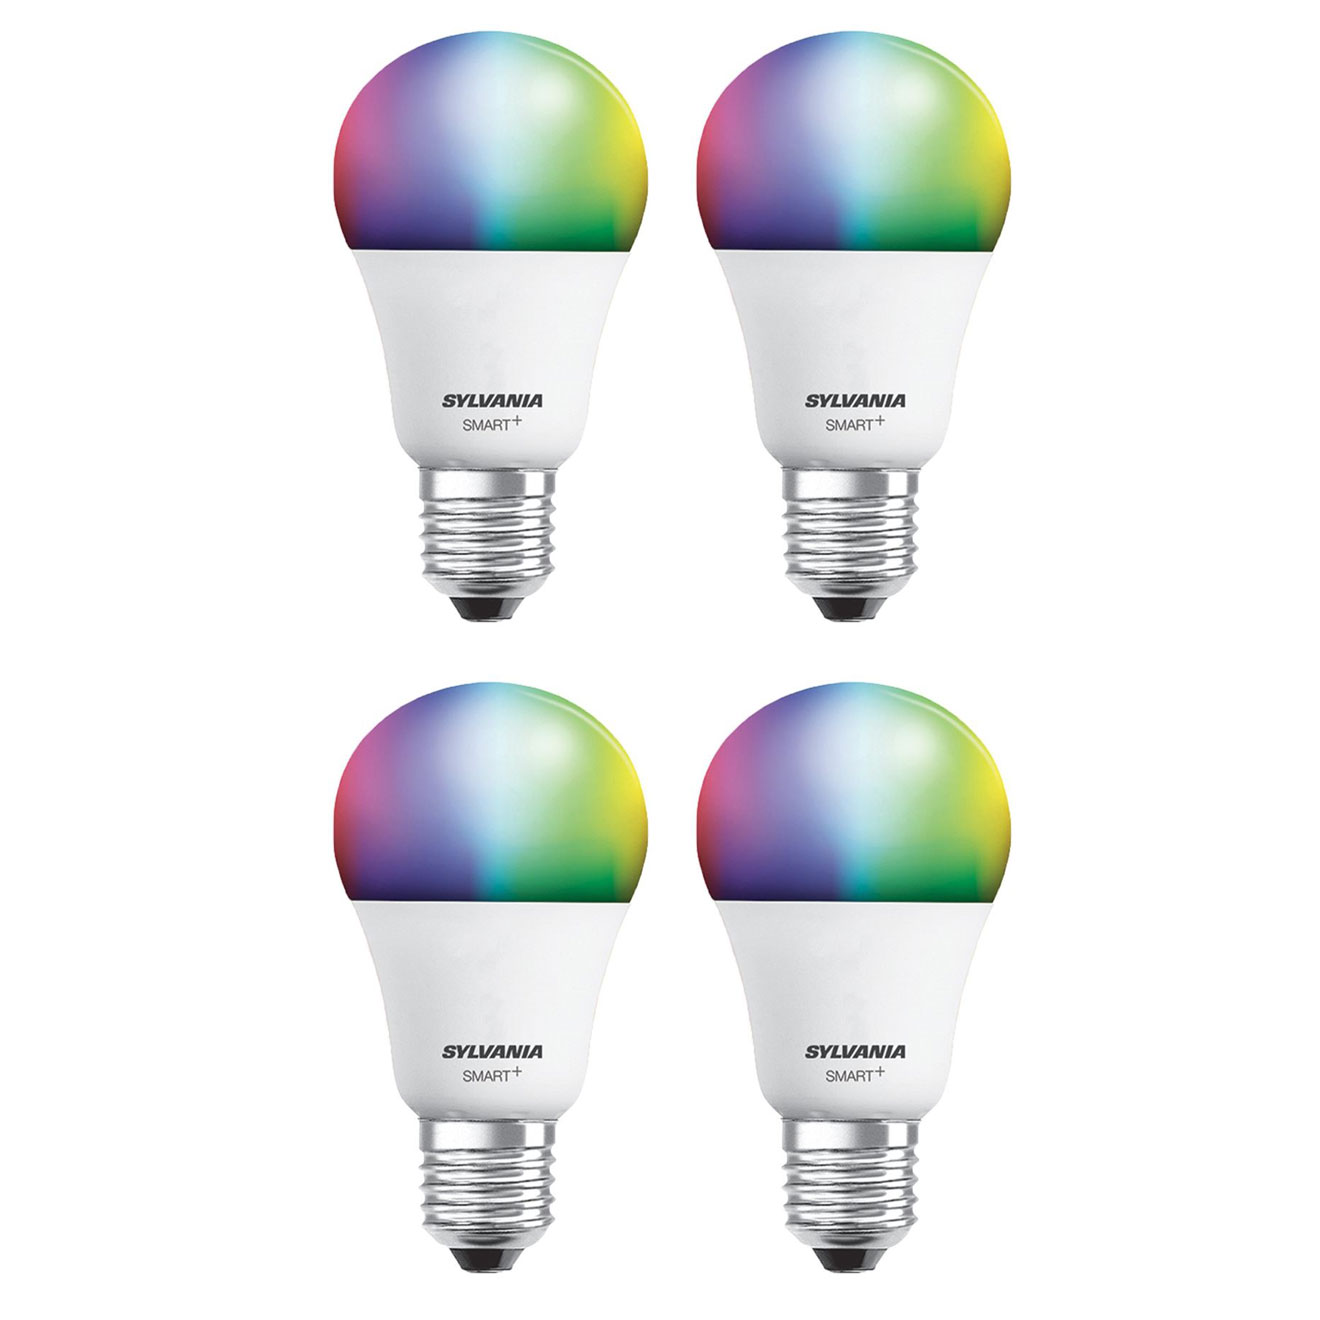 Sylvania Smart+ Bluetooth Full Color A19 LED Bulb for Apple HomeKit (4 Pack)